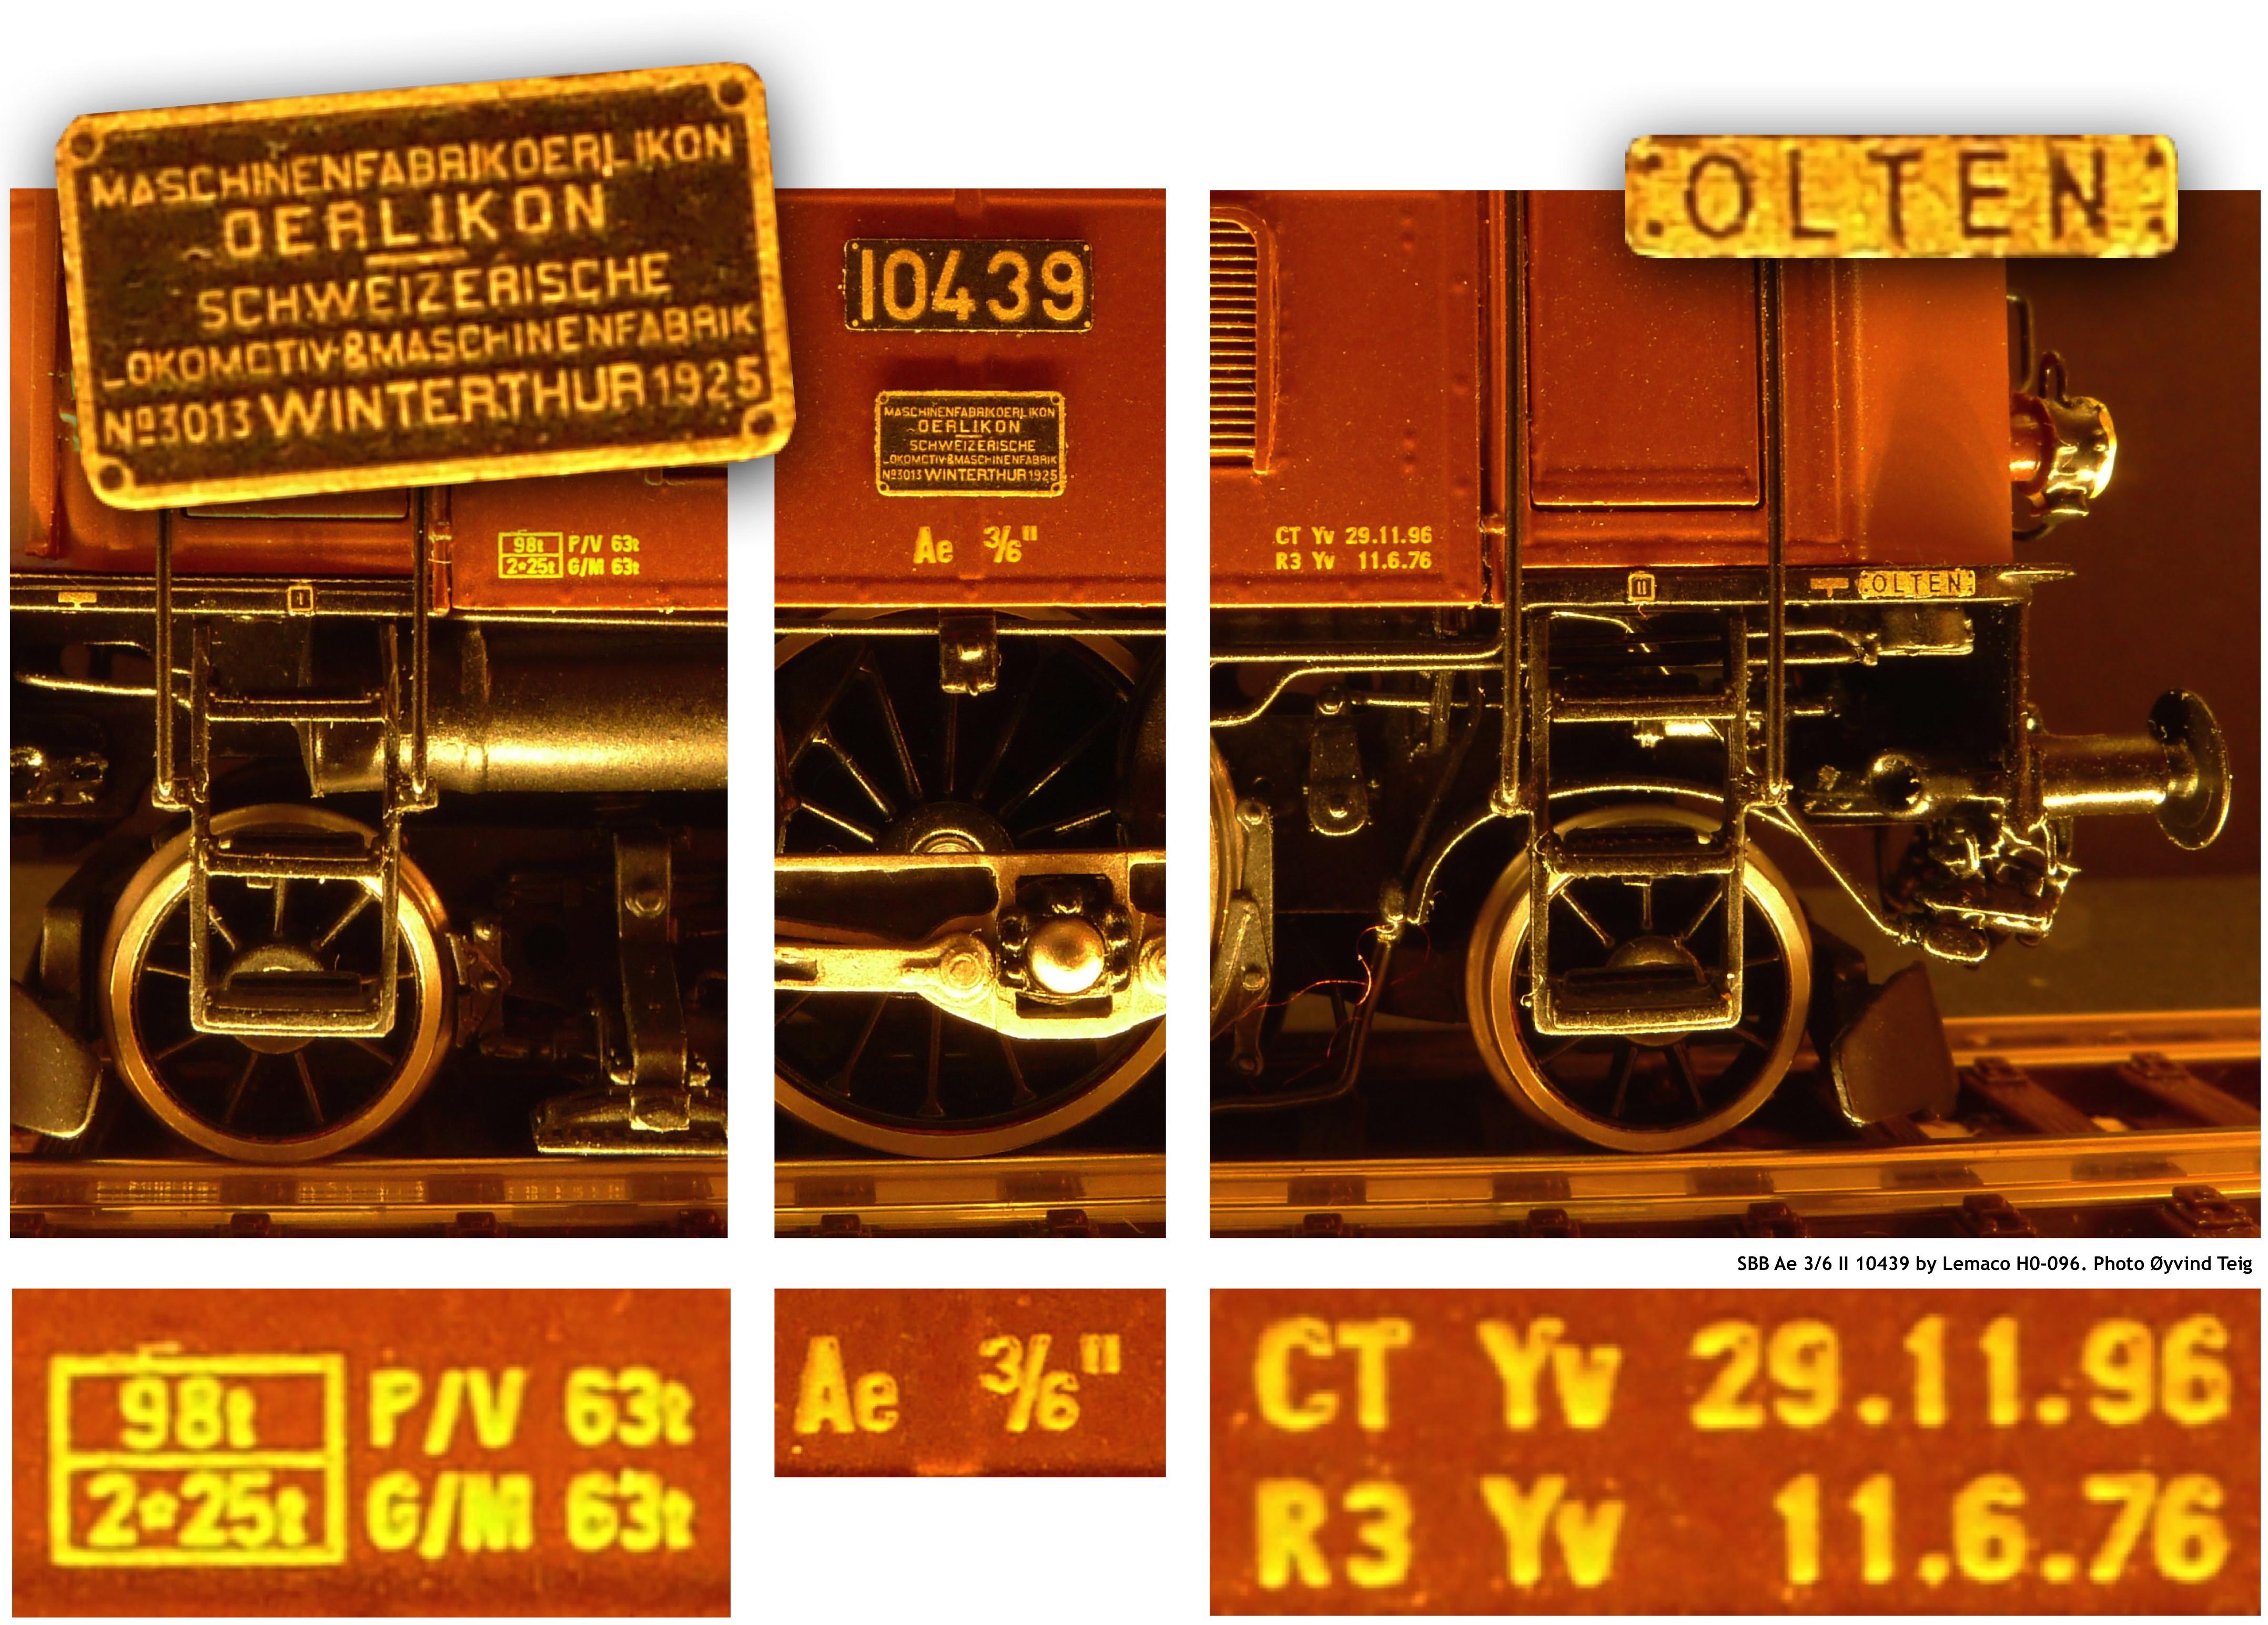 087 Fig9 Sbb Ae 3 6 Ii Ho 096 By Lemaco Photo 216 Yvind Teig